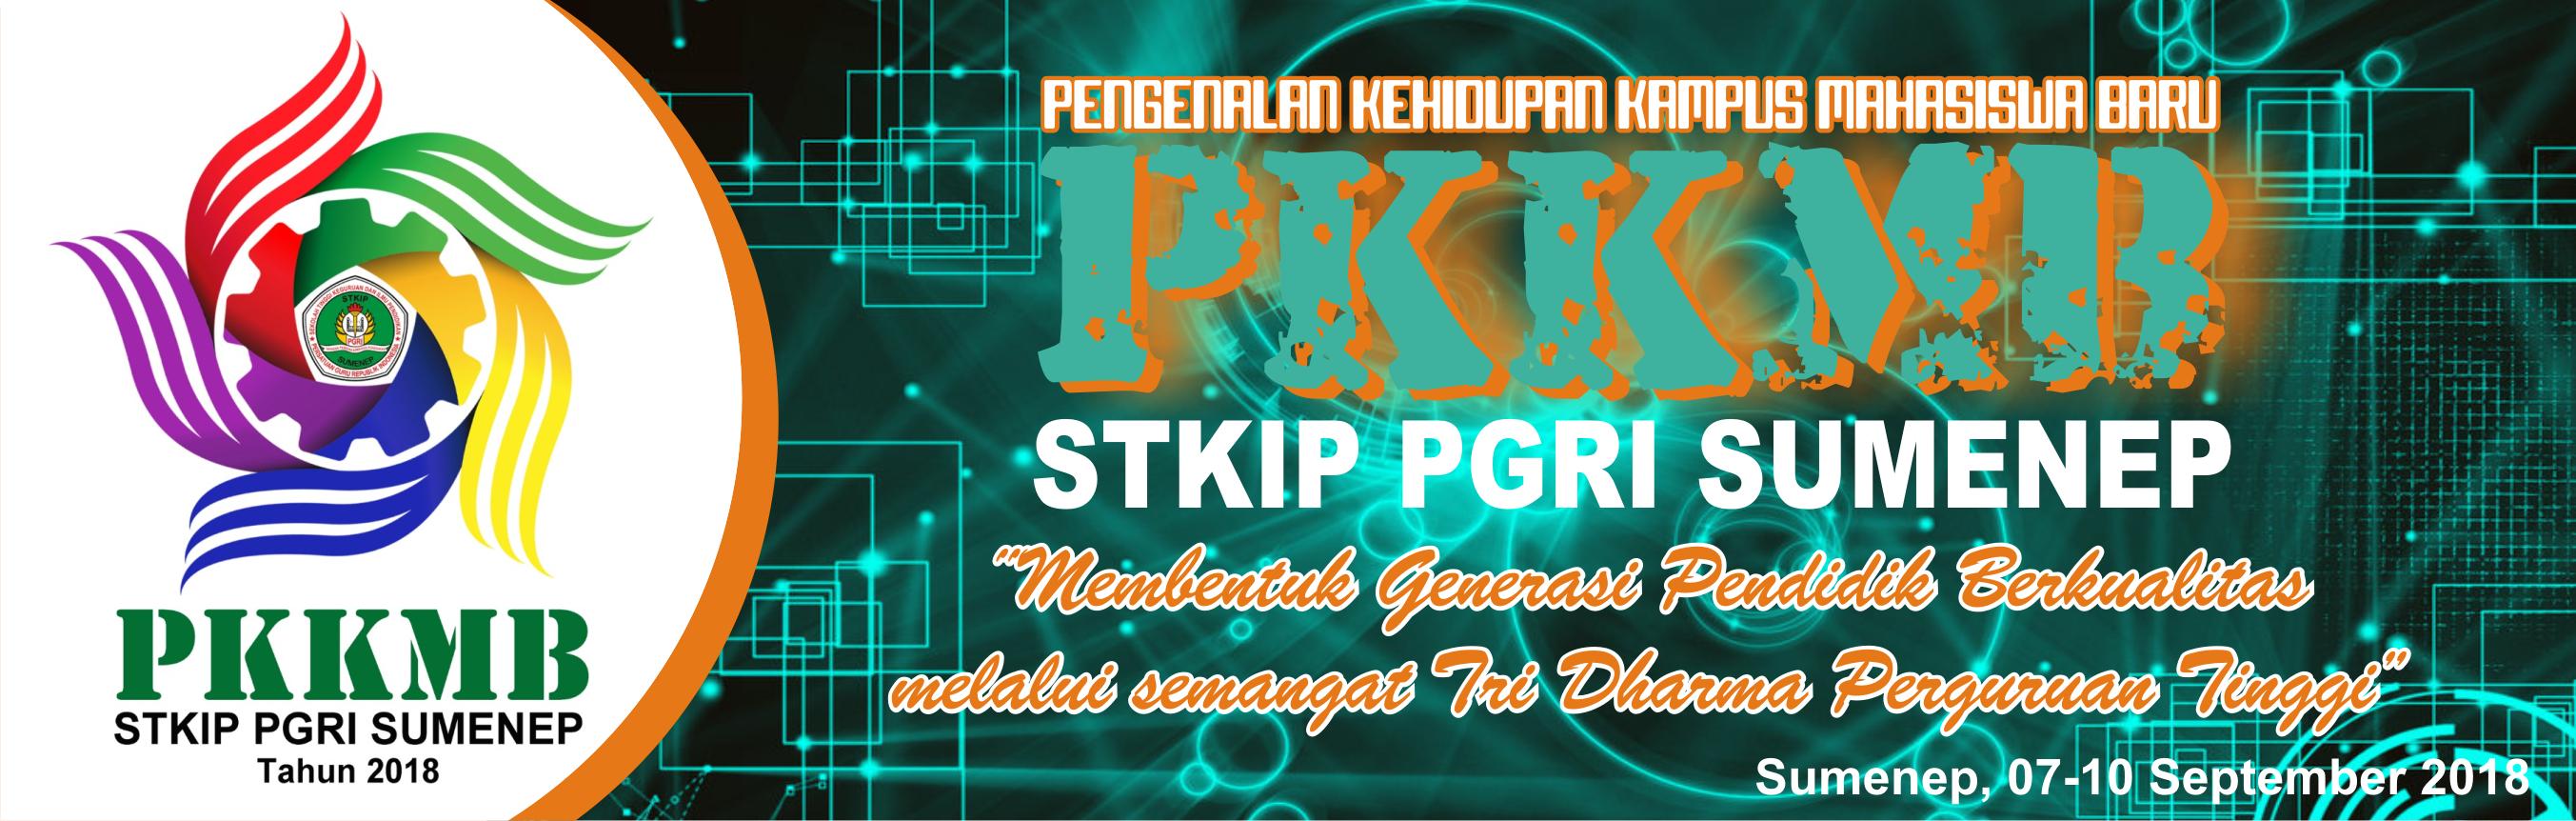 PKKMB STKIP PGRI SUMENEP 2018